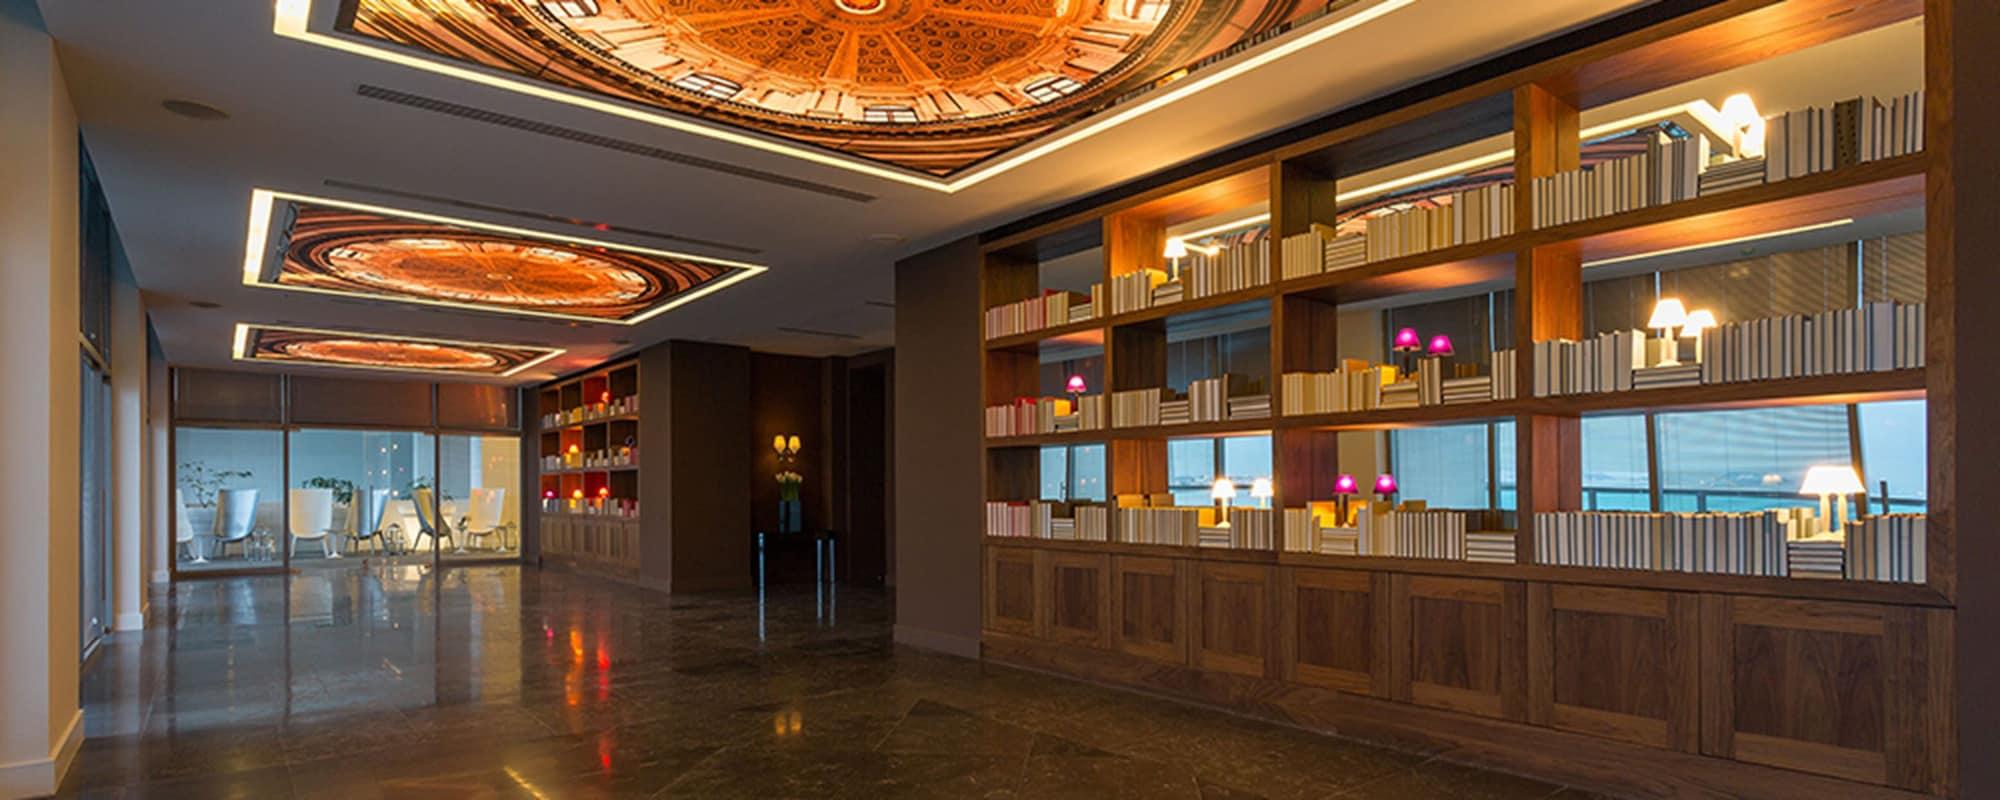 Yoo Towers Suites, Panamá